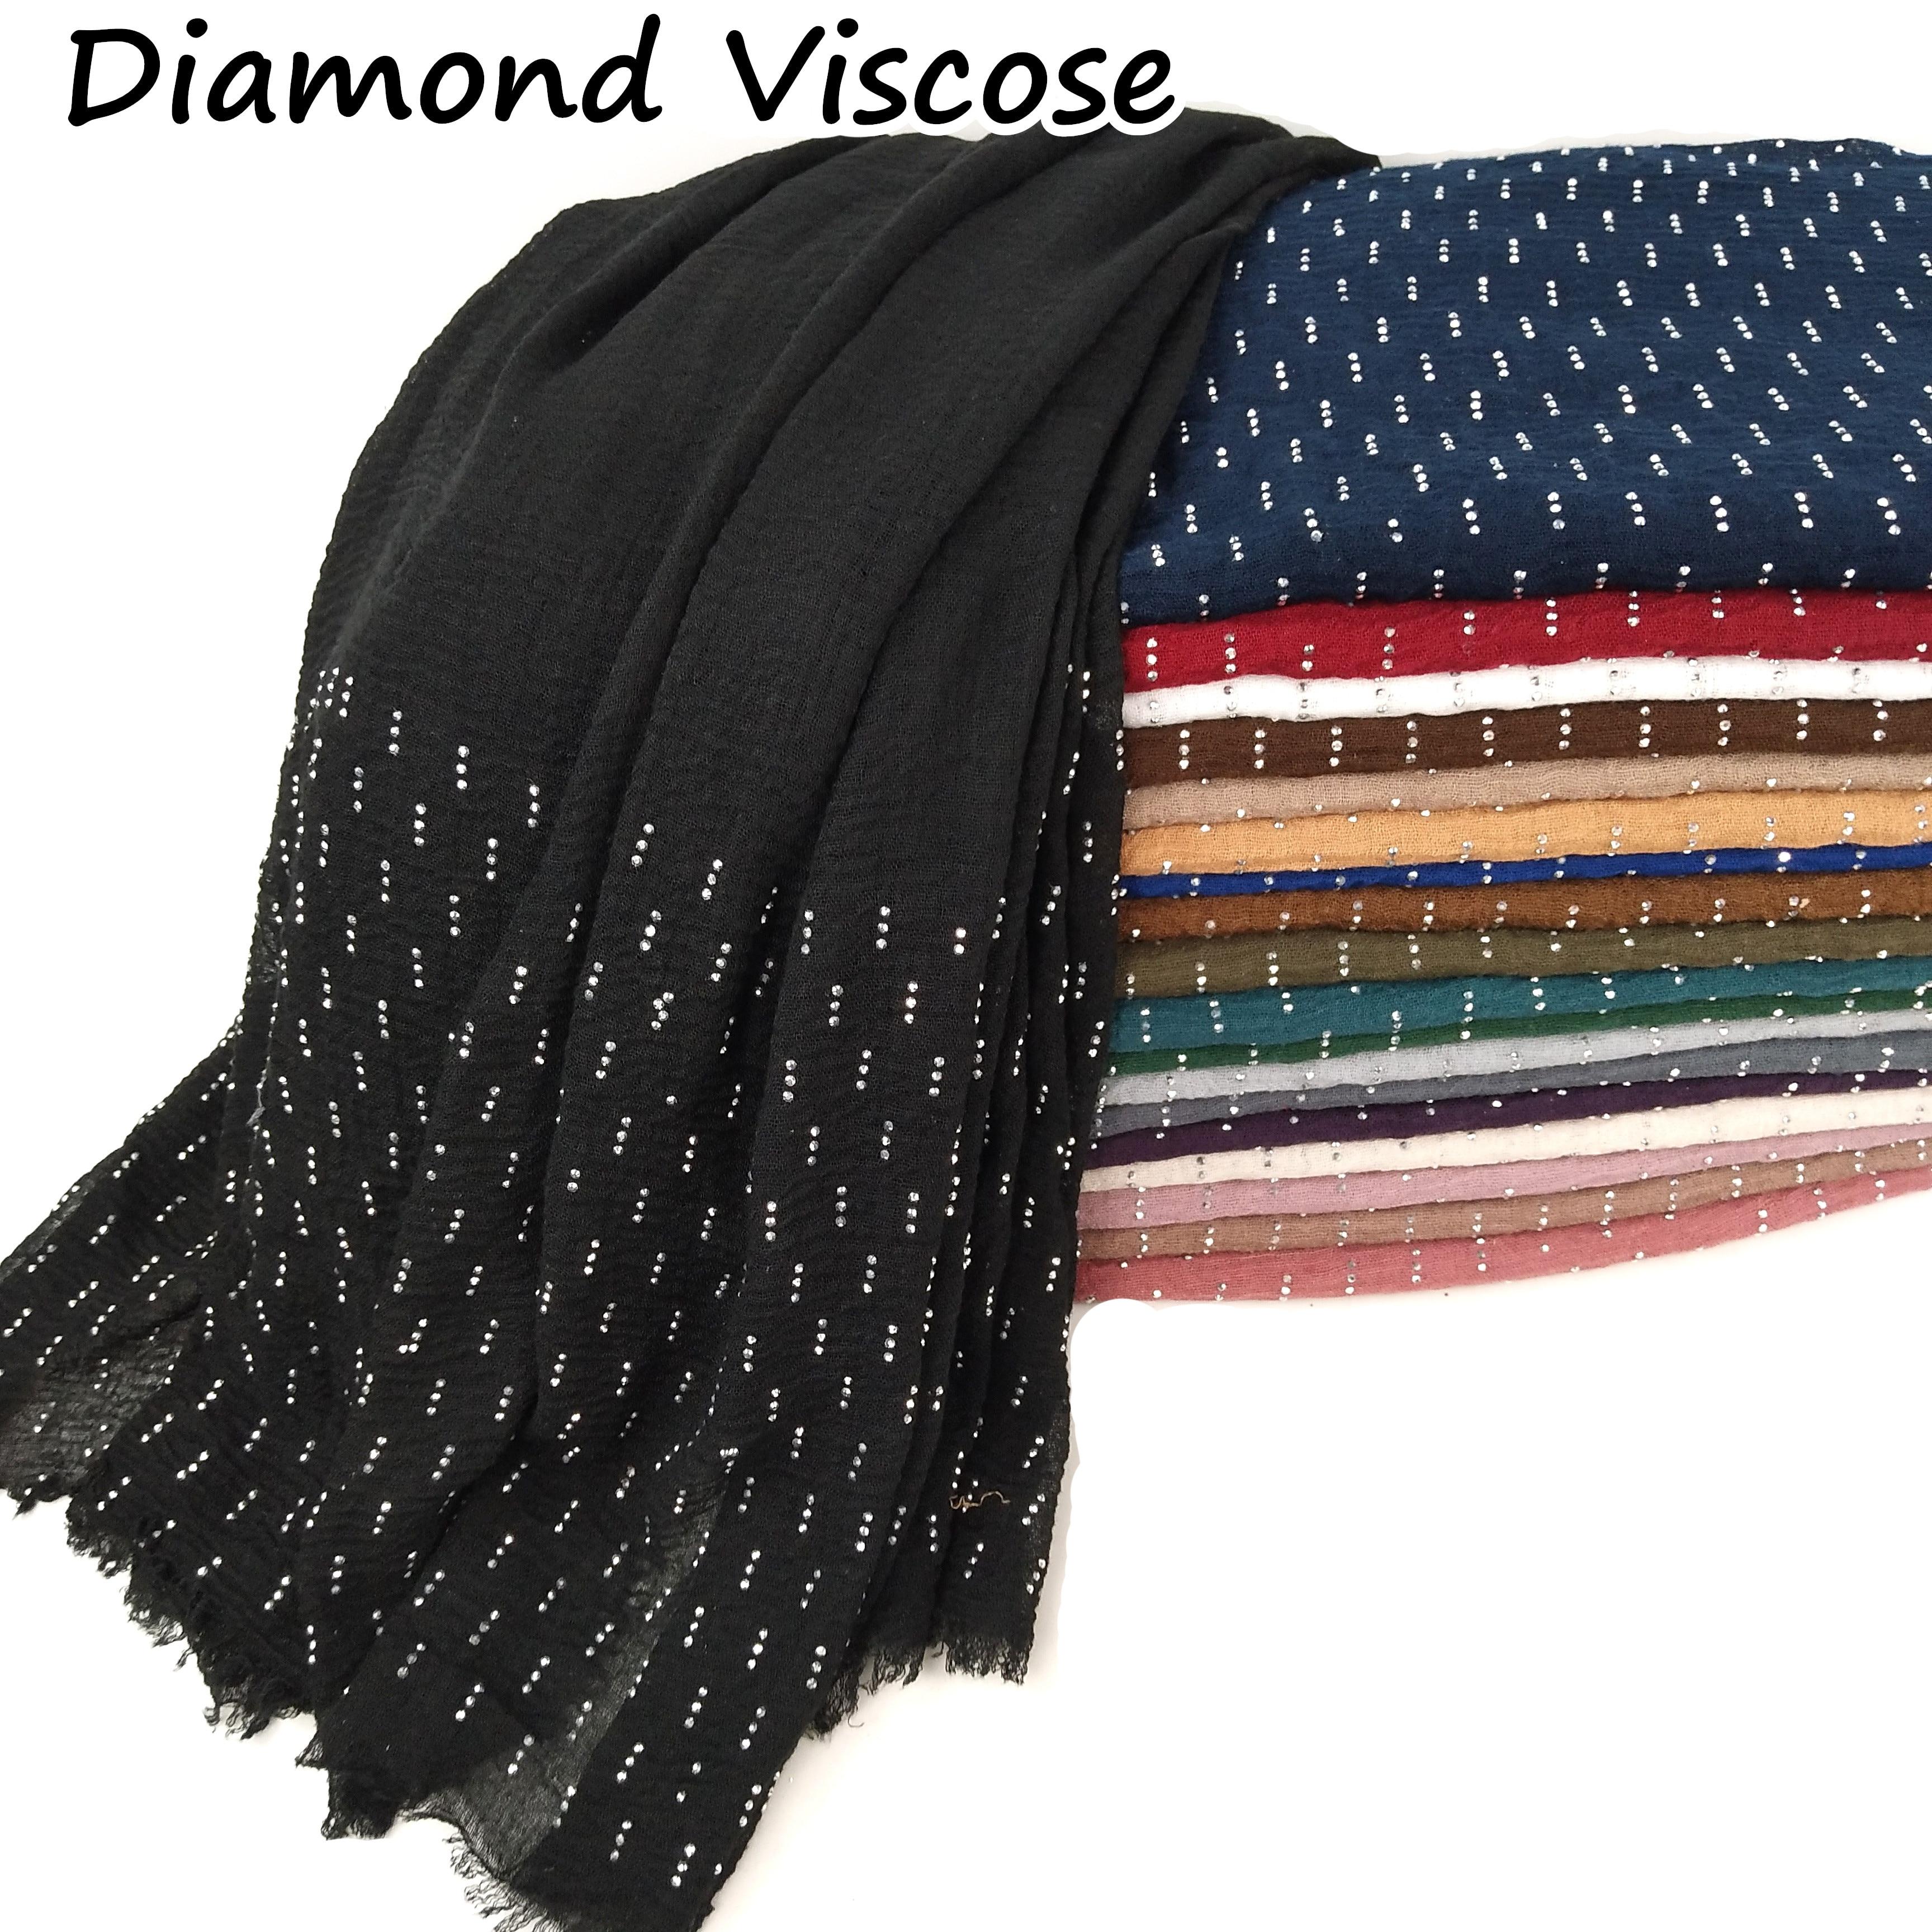 T1 10pcs Diamond Crinkle Plain Wrinkle Wrap Bubble Cotton Viscose Long Shawl Scarf Women Crinkled Hijab Shawl  Head Hijab Scarf